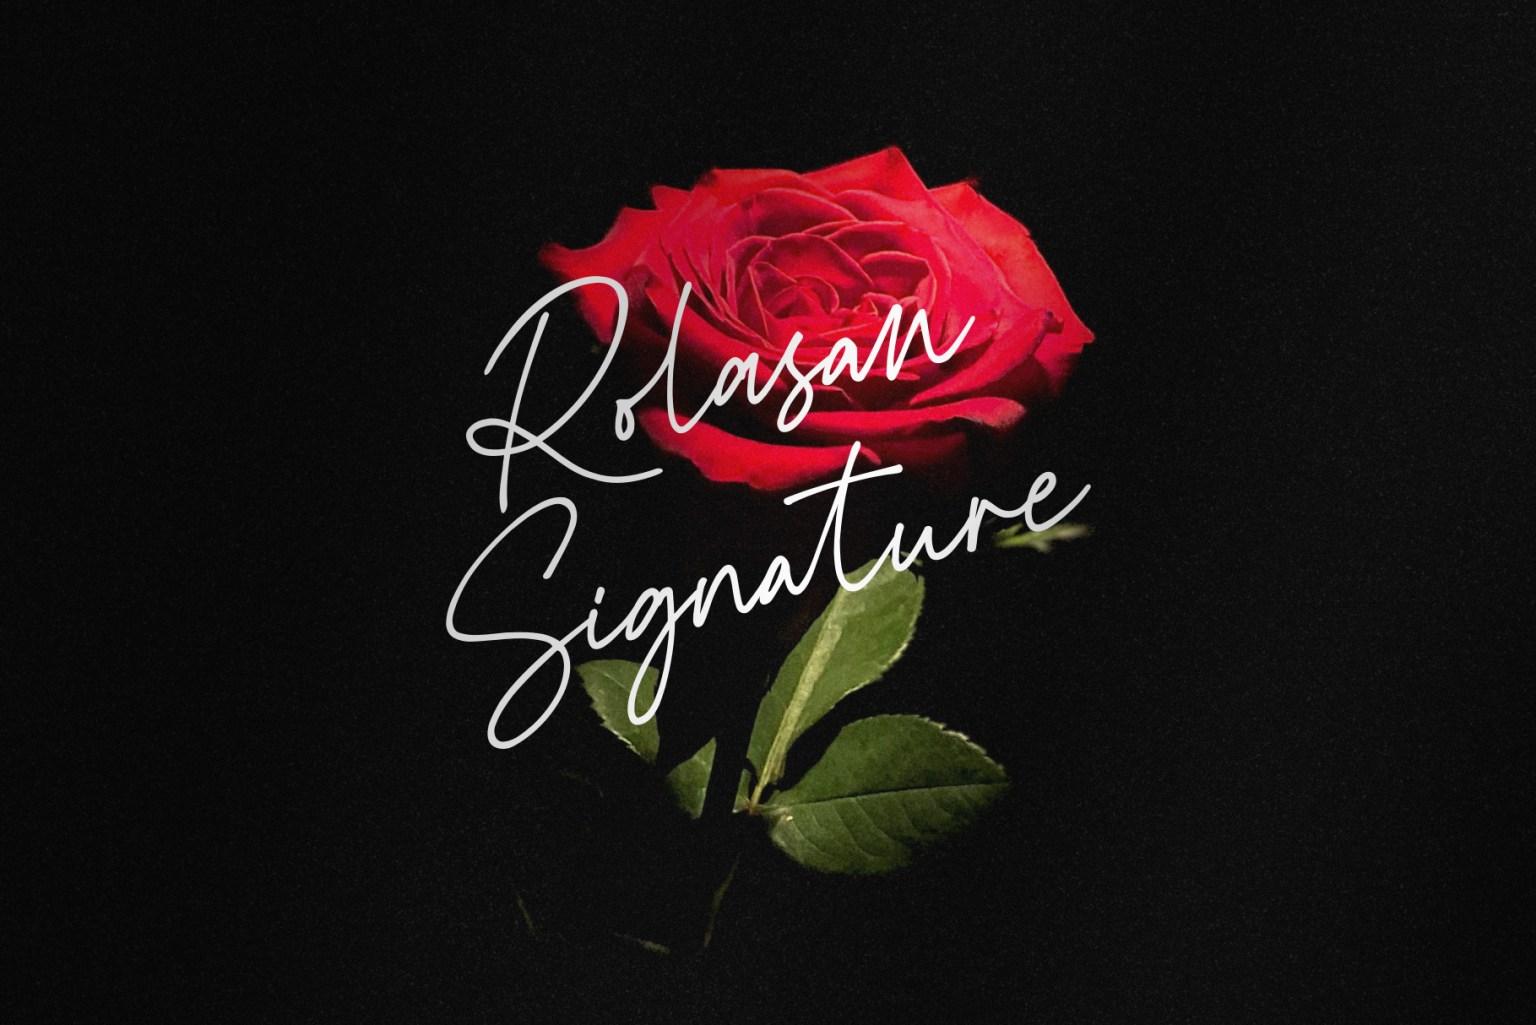 Rolasan Signature Font